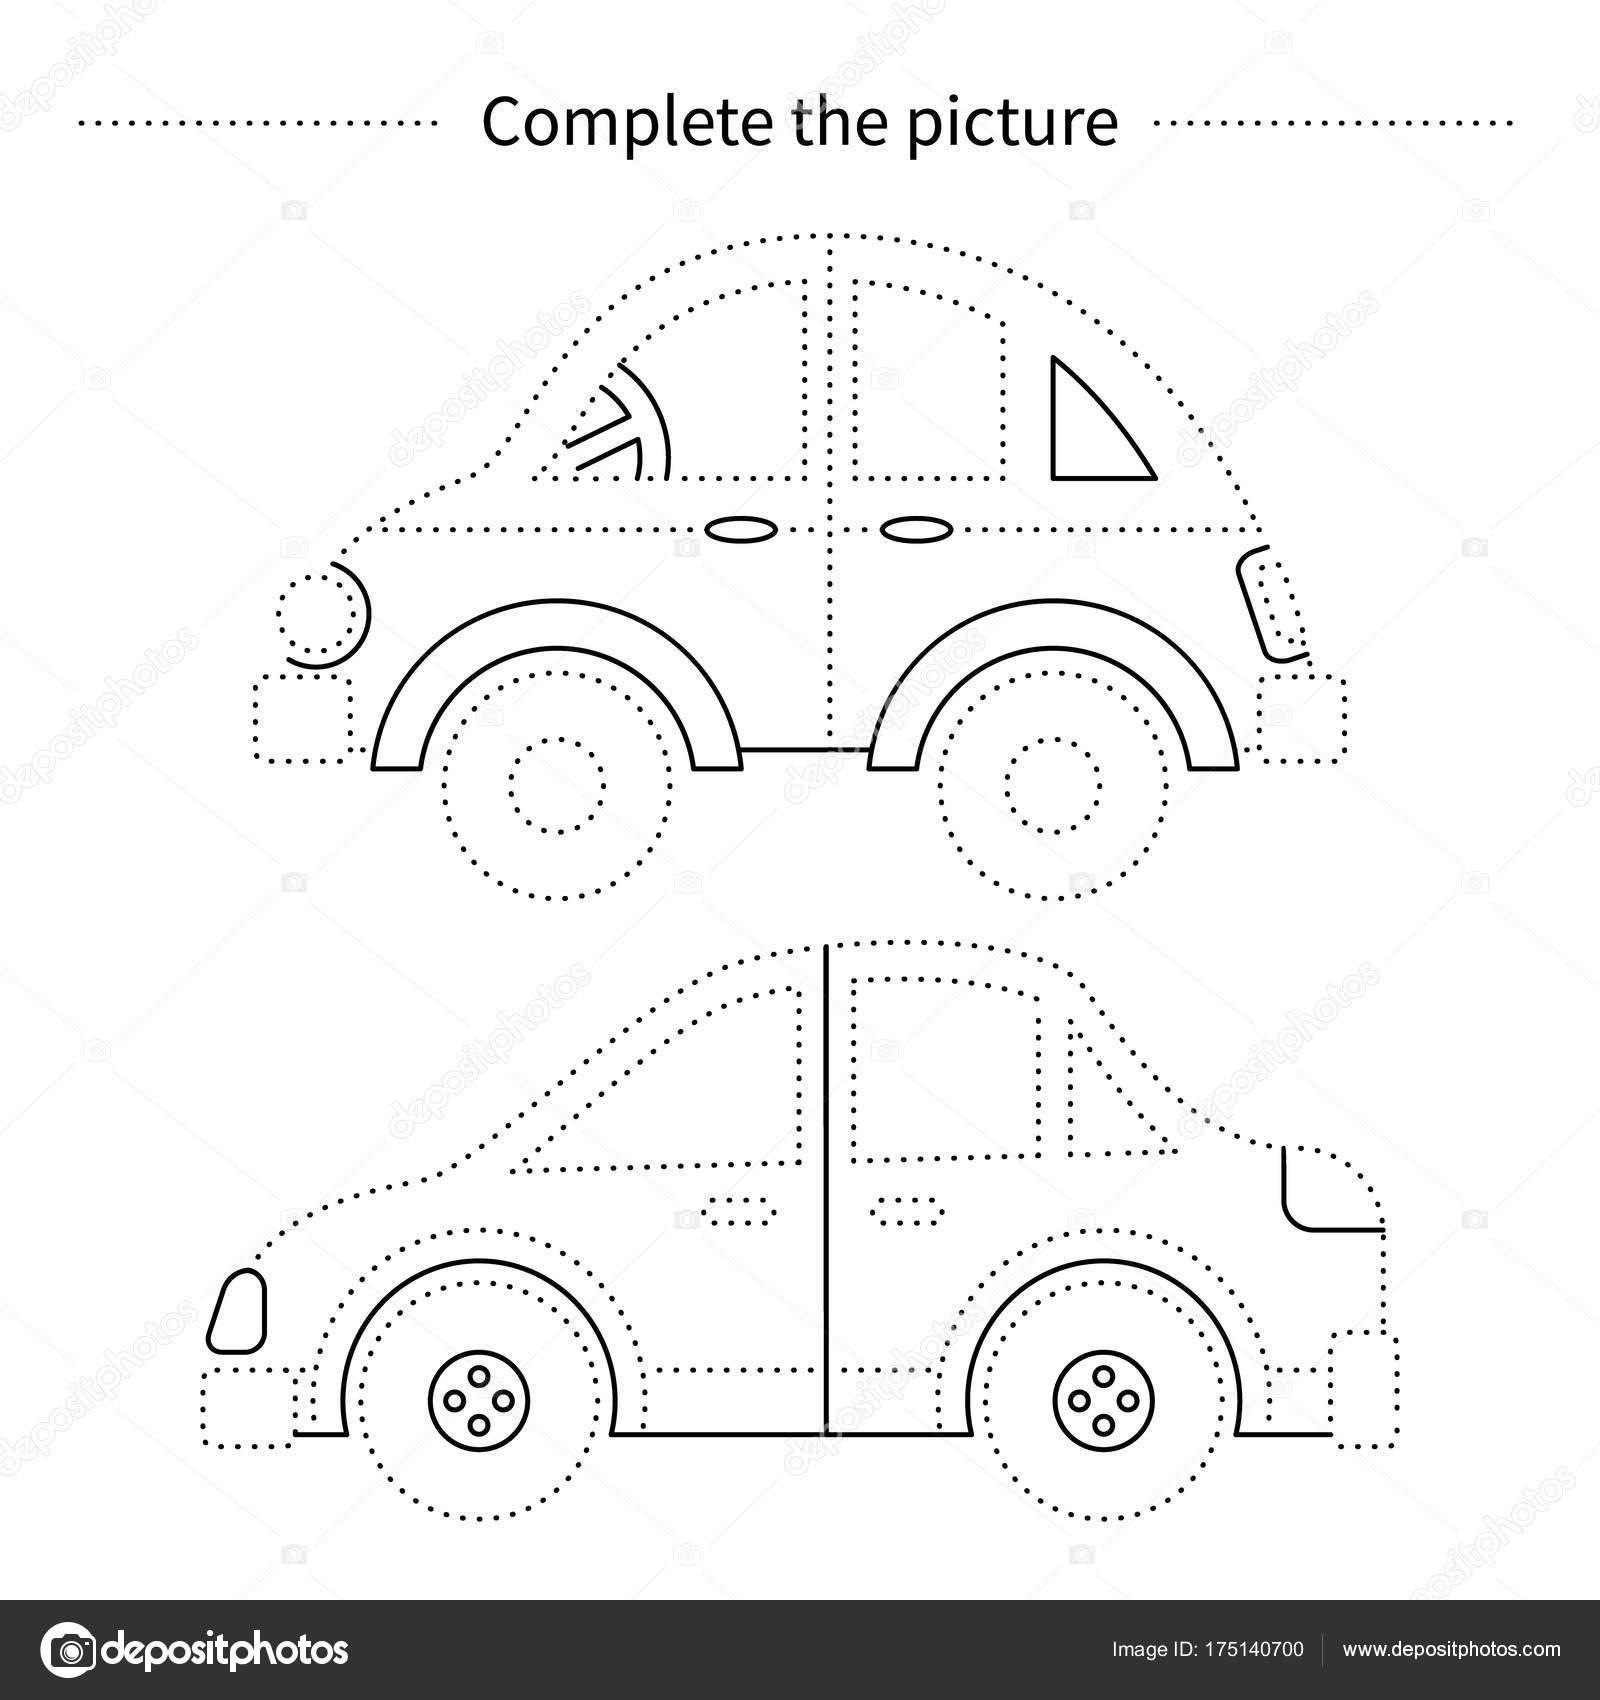 Araba Resmi Tamamlamak Stok Vektör Ninafedorova 175140700